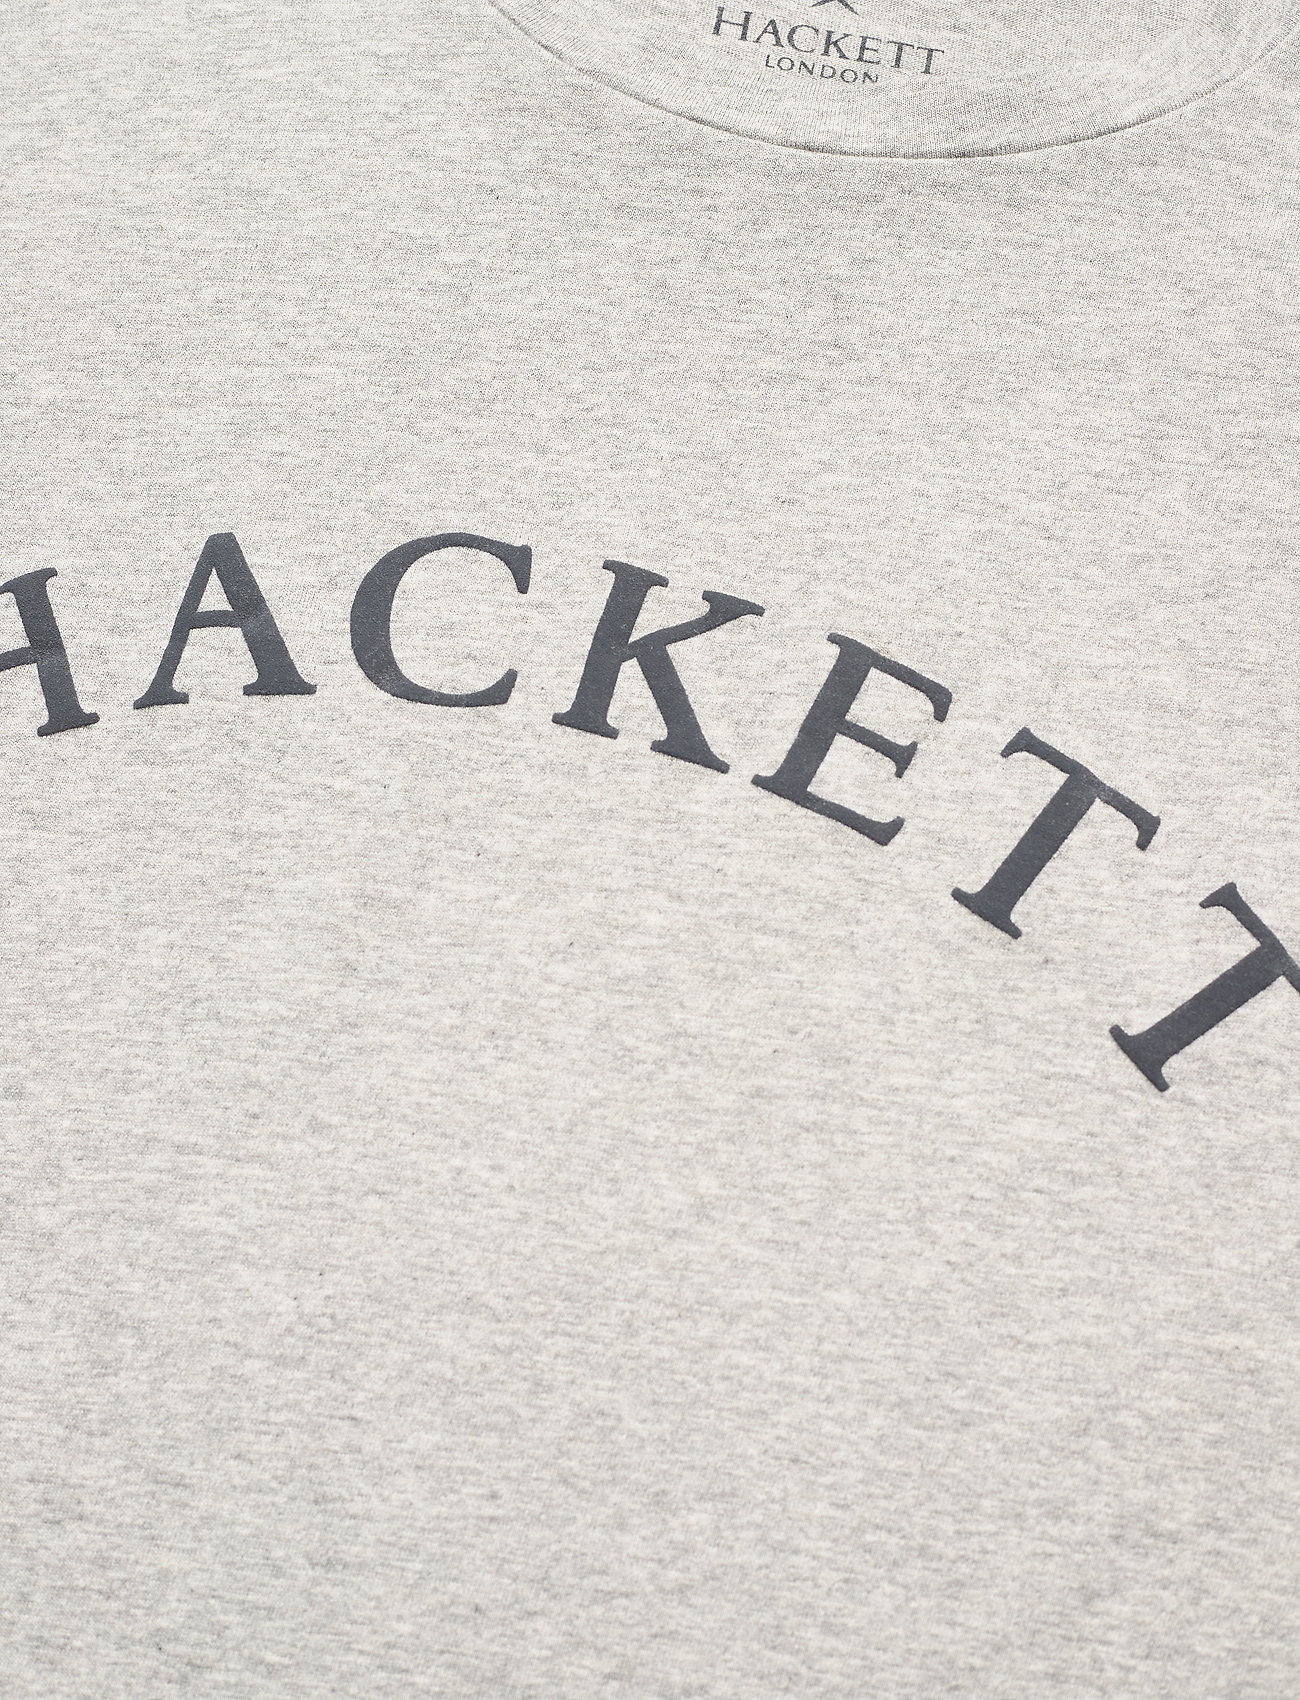 Hackett London GBK TEE - T-skjorter GREY MARL - Menn Klær